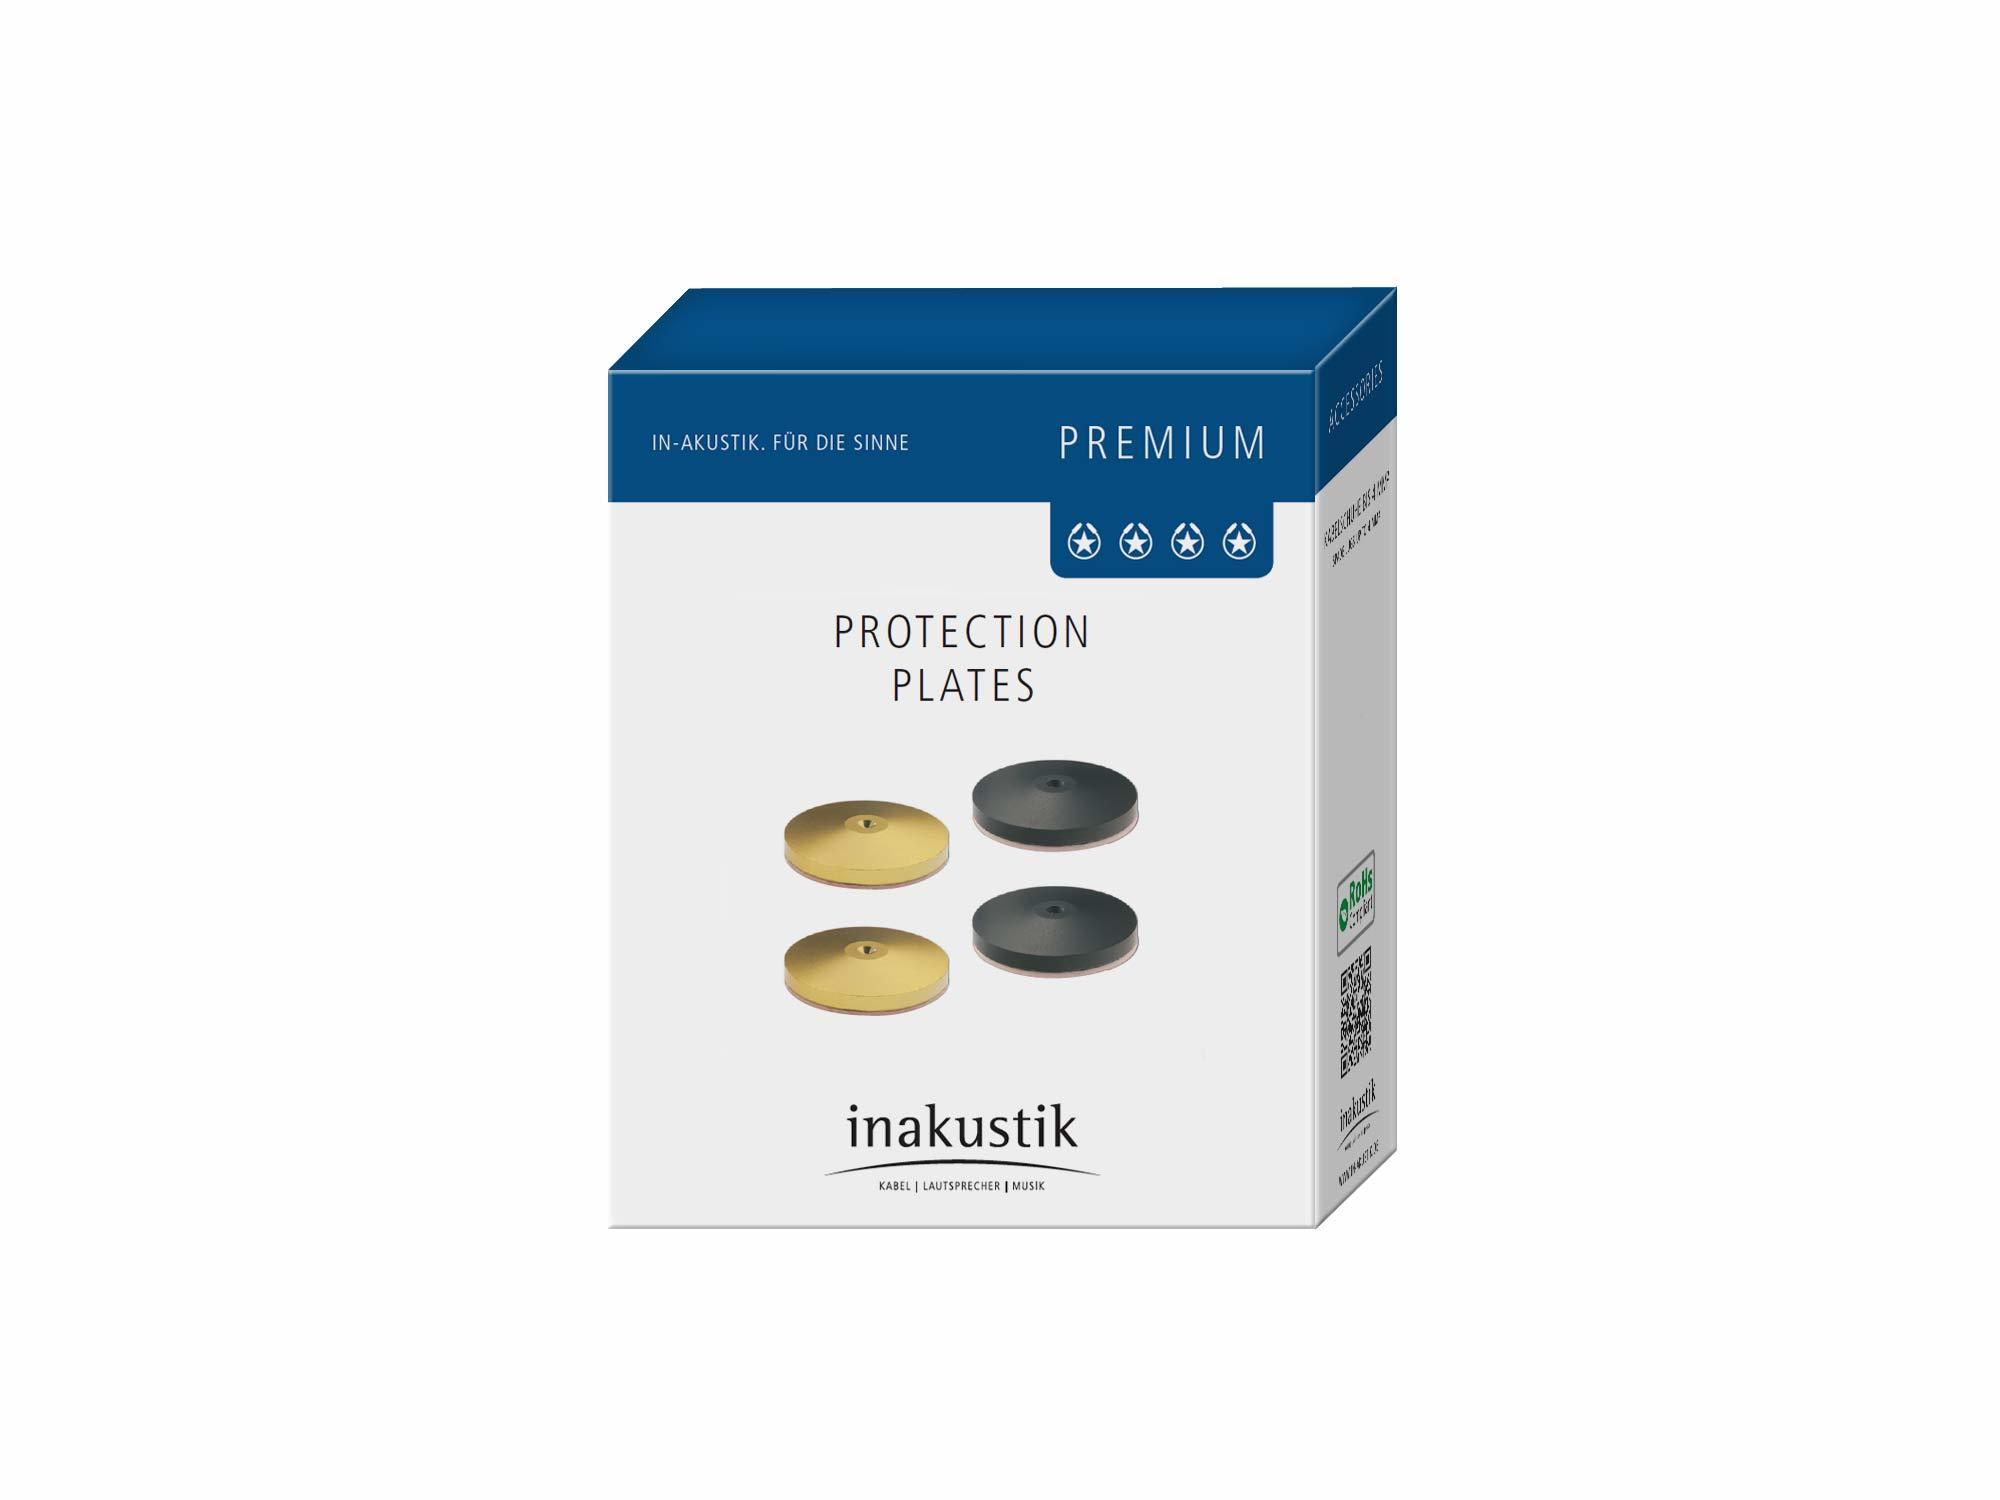 Inakustik Premium Pic, 4 pcs, golden, 30 mm, 008480